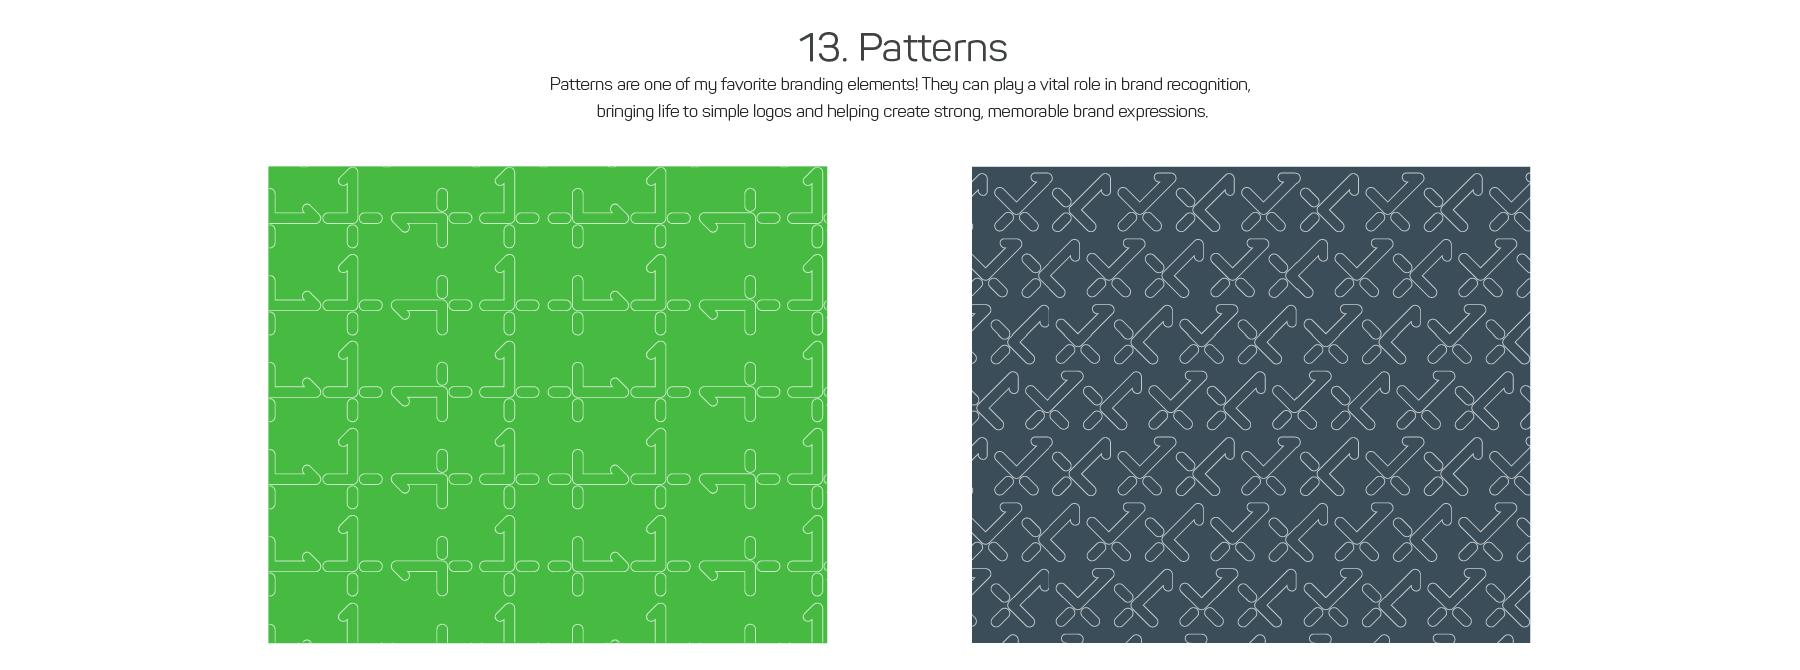 11. Patterns